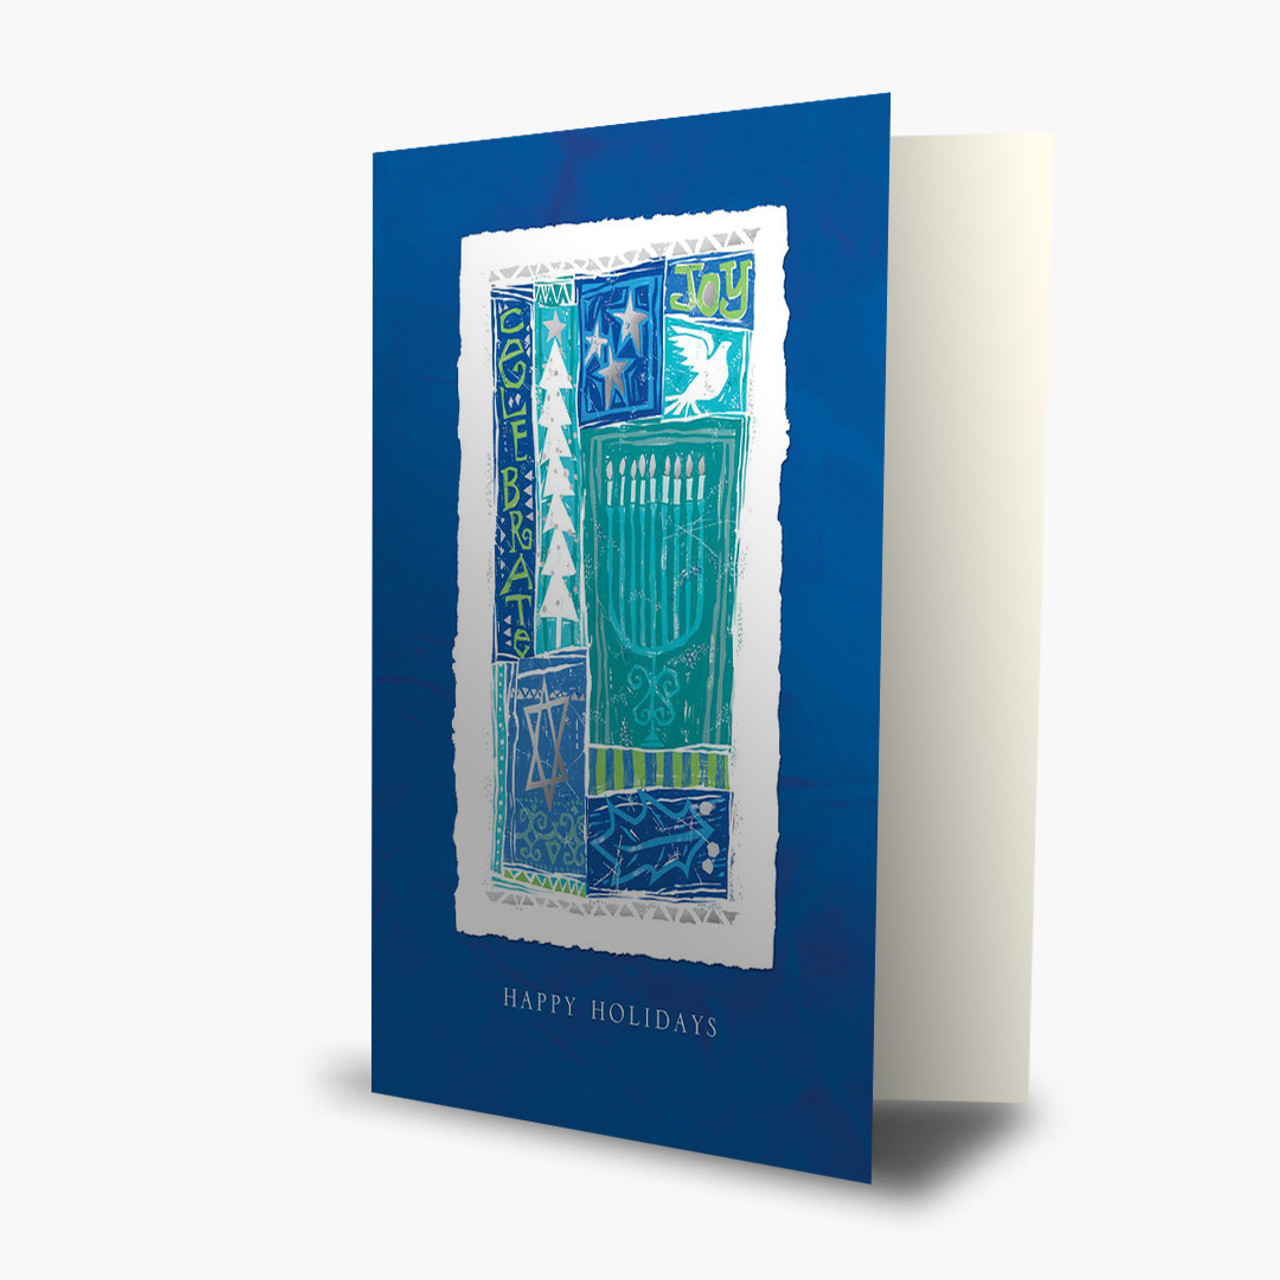 Cultures Unite Christmas Card